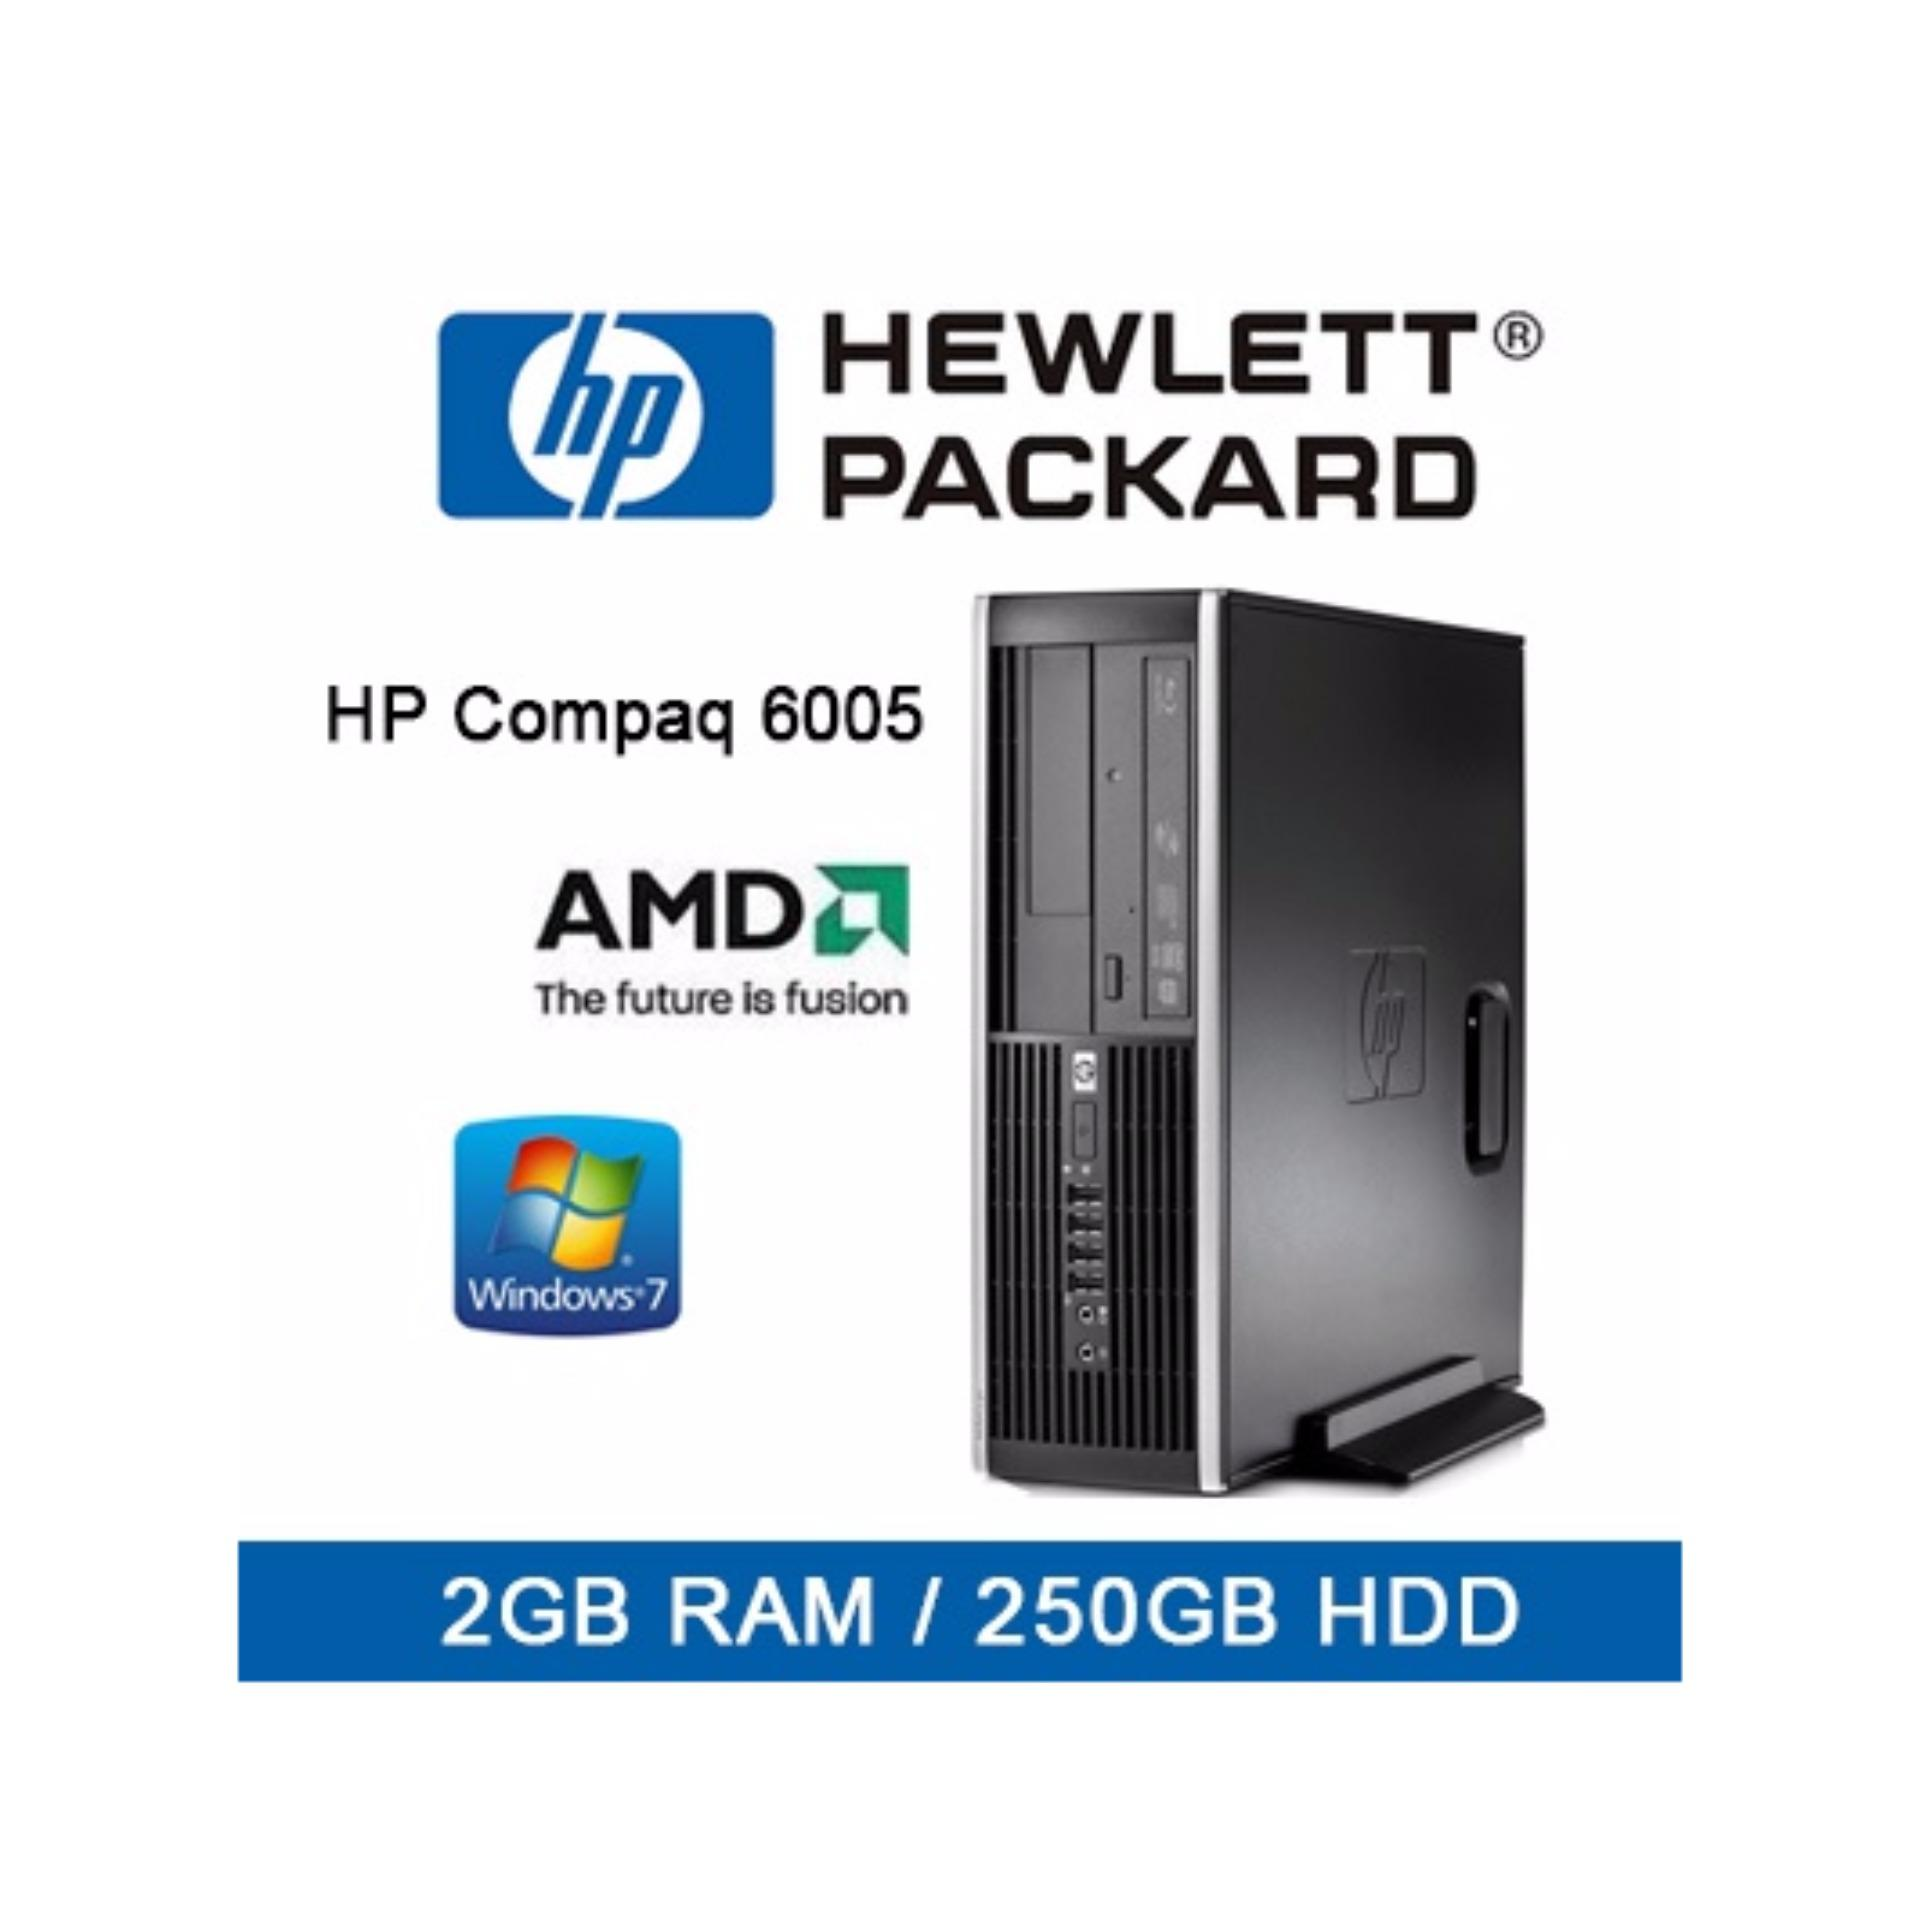 [Refurbished] HP Compaq 6005 pro SFF Desktop / AMD-B26 / 2GB RAM / 250GB HDD / Win 7 / 1mth Warranty